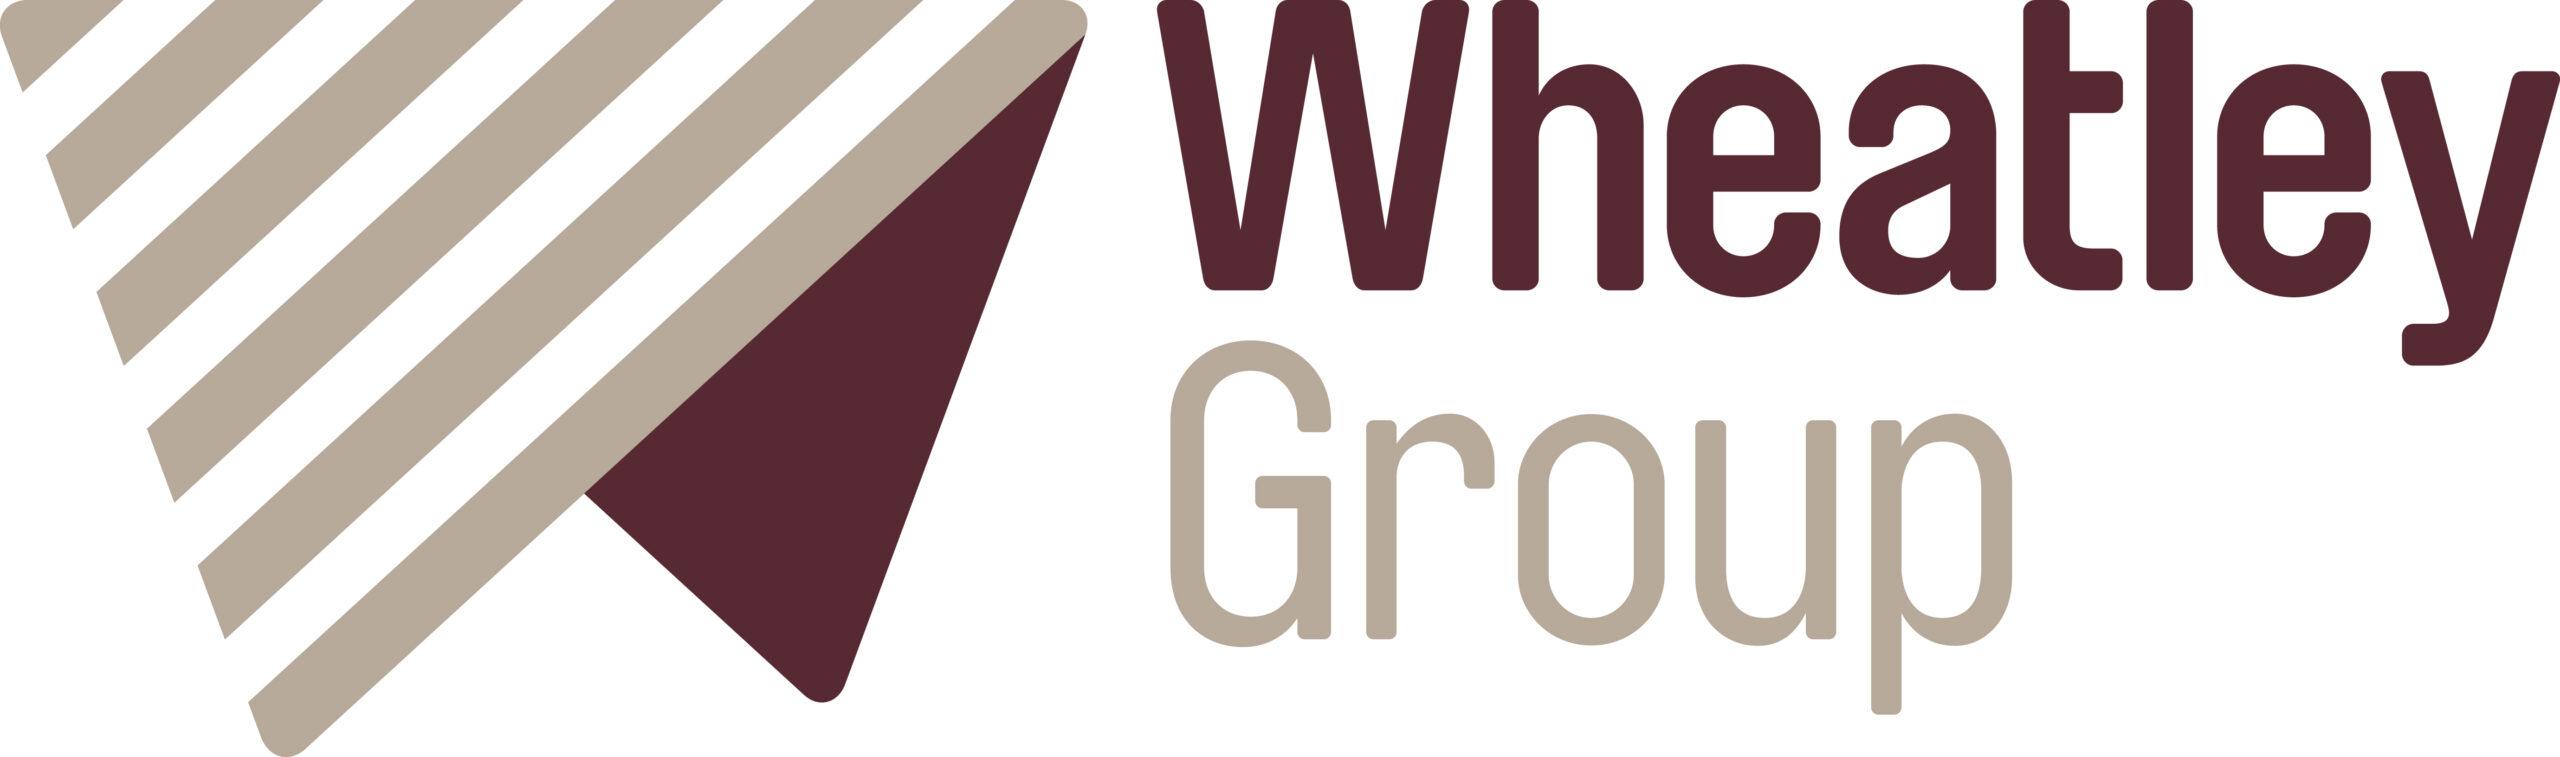 \wheatley Group